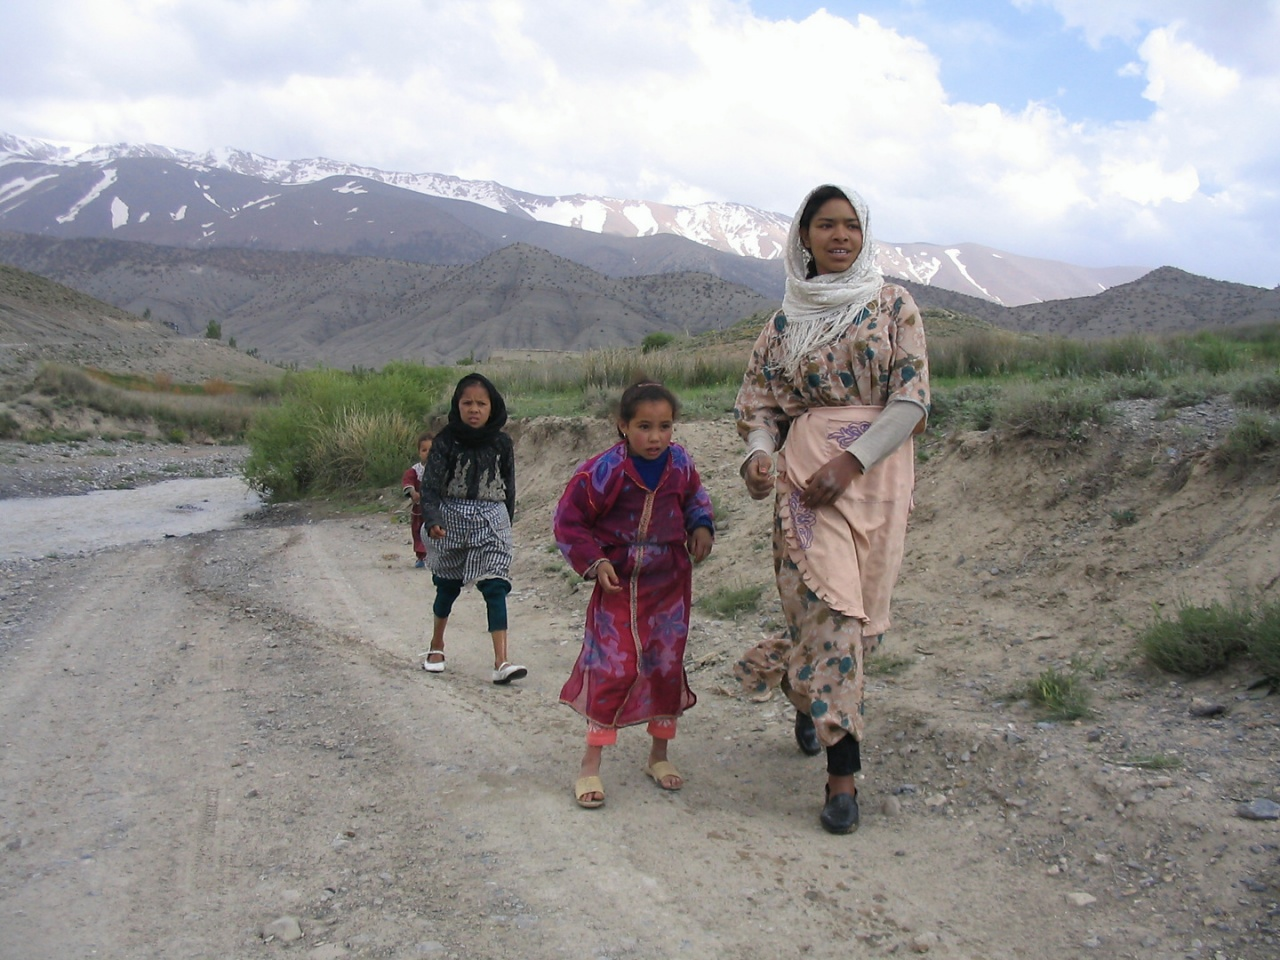 20040518_1756-Berber_bei_ihrem_Dorf